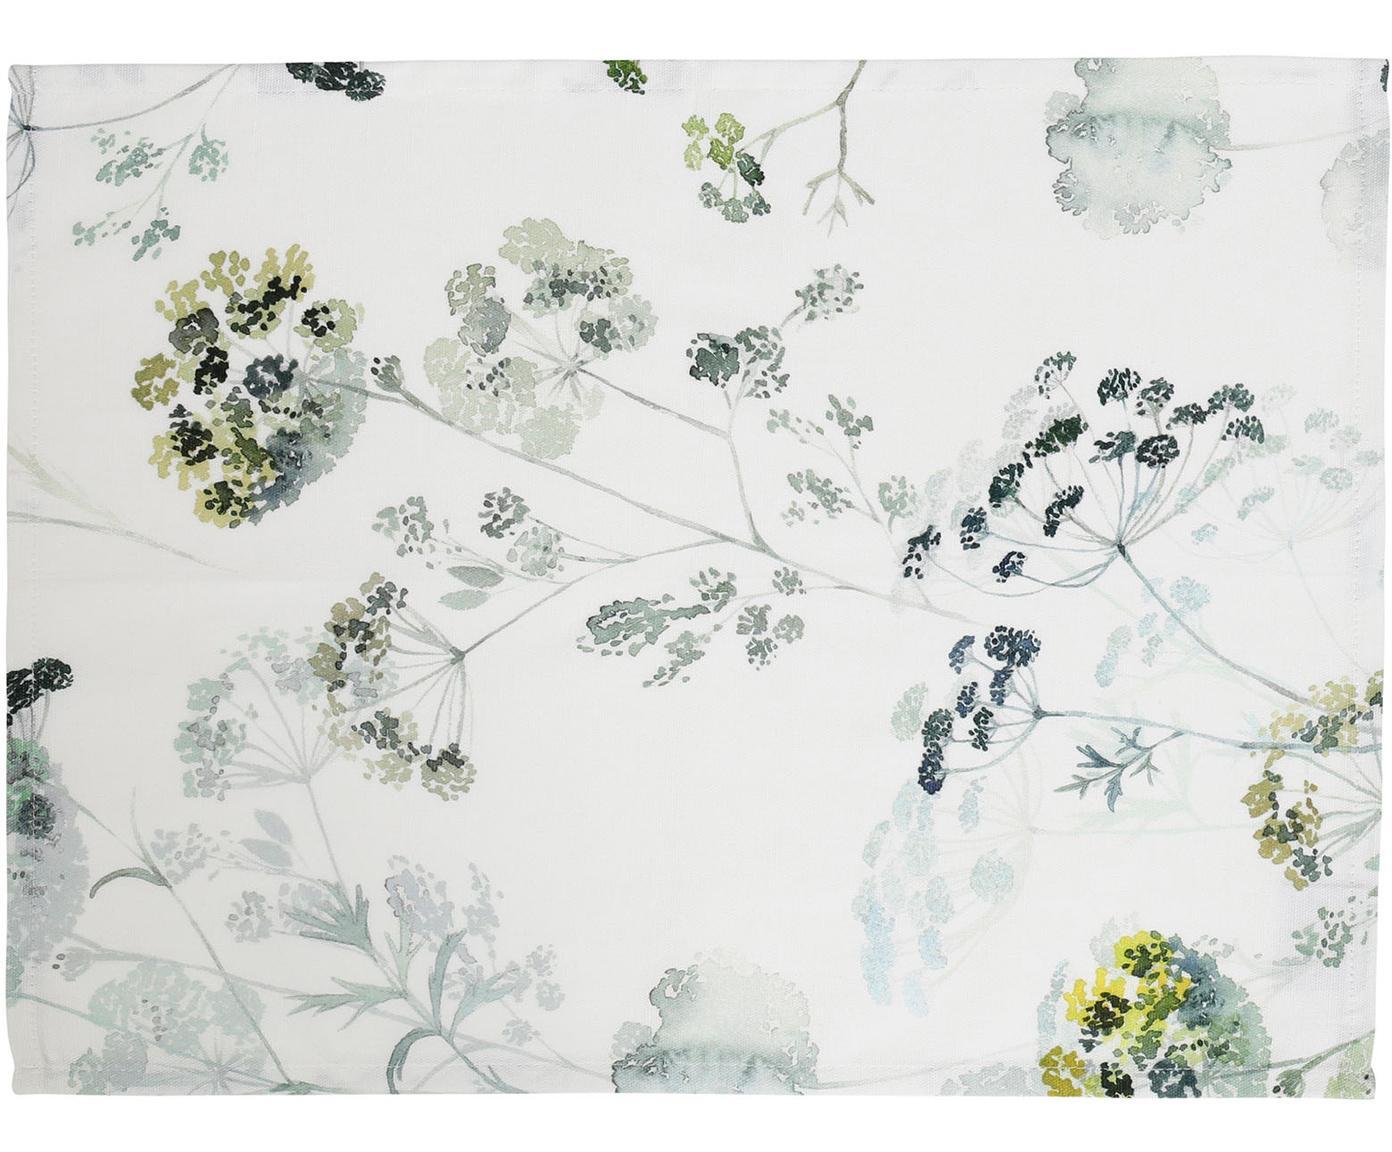 Manteles individuales Herbier, 2uds., Algodón, Blanco, verde, An 38 x L 50 cm